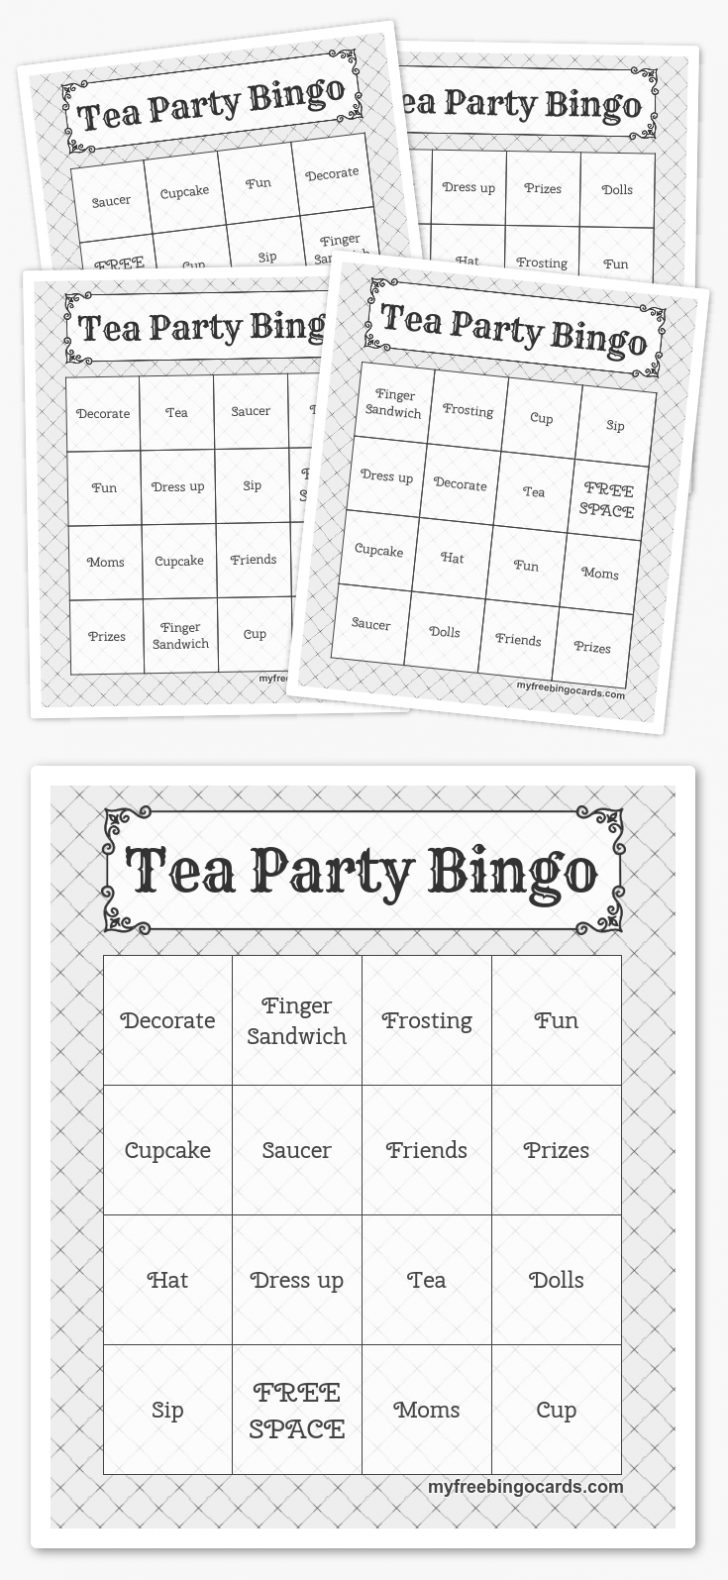 5×5 Printable Bingo Cards